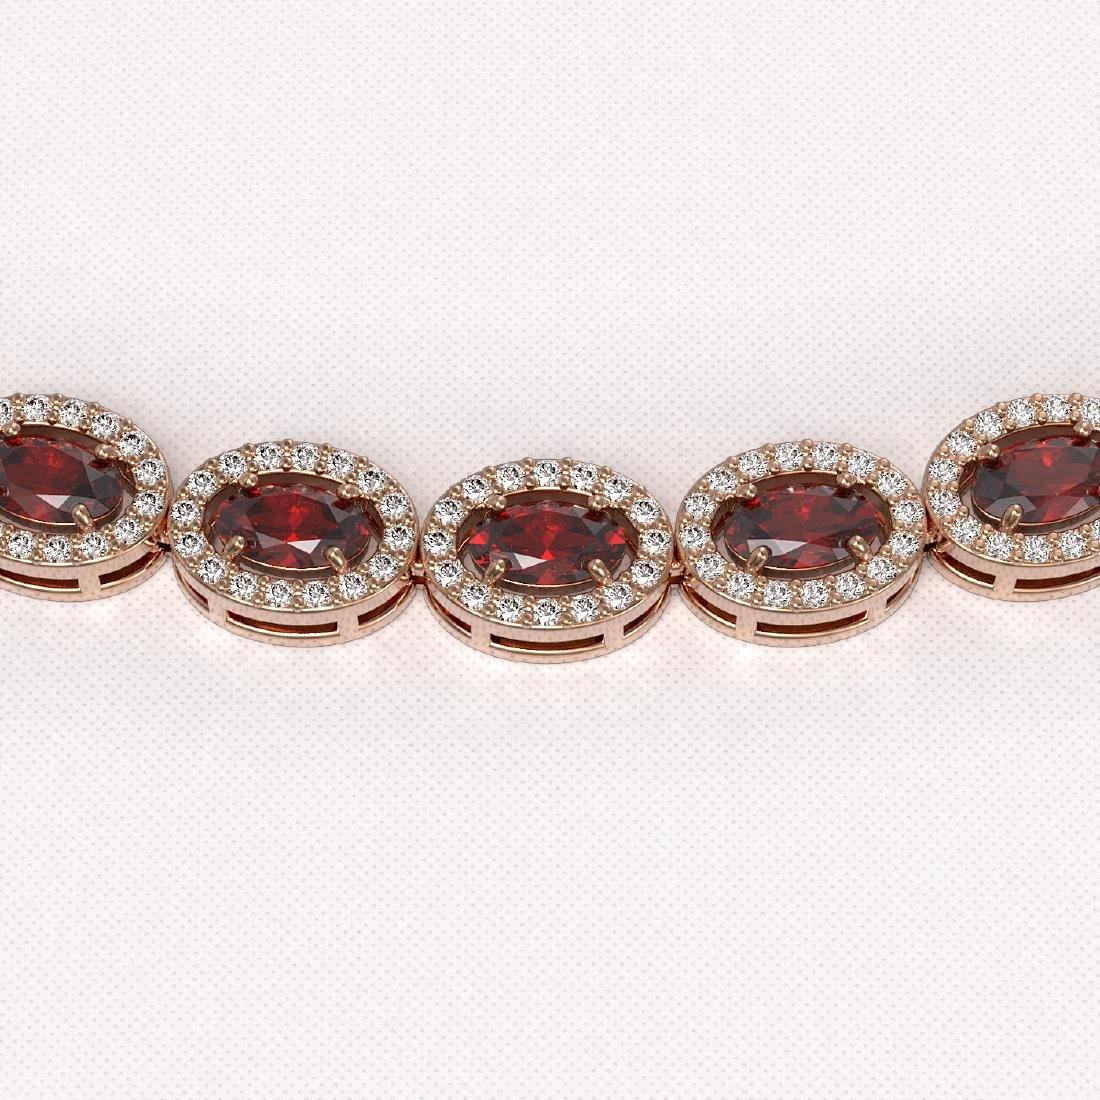 21.04 CTW Garnet & Diamond Halo Necklace 10K Rose Gold - 3